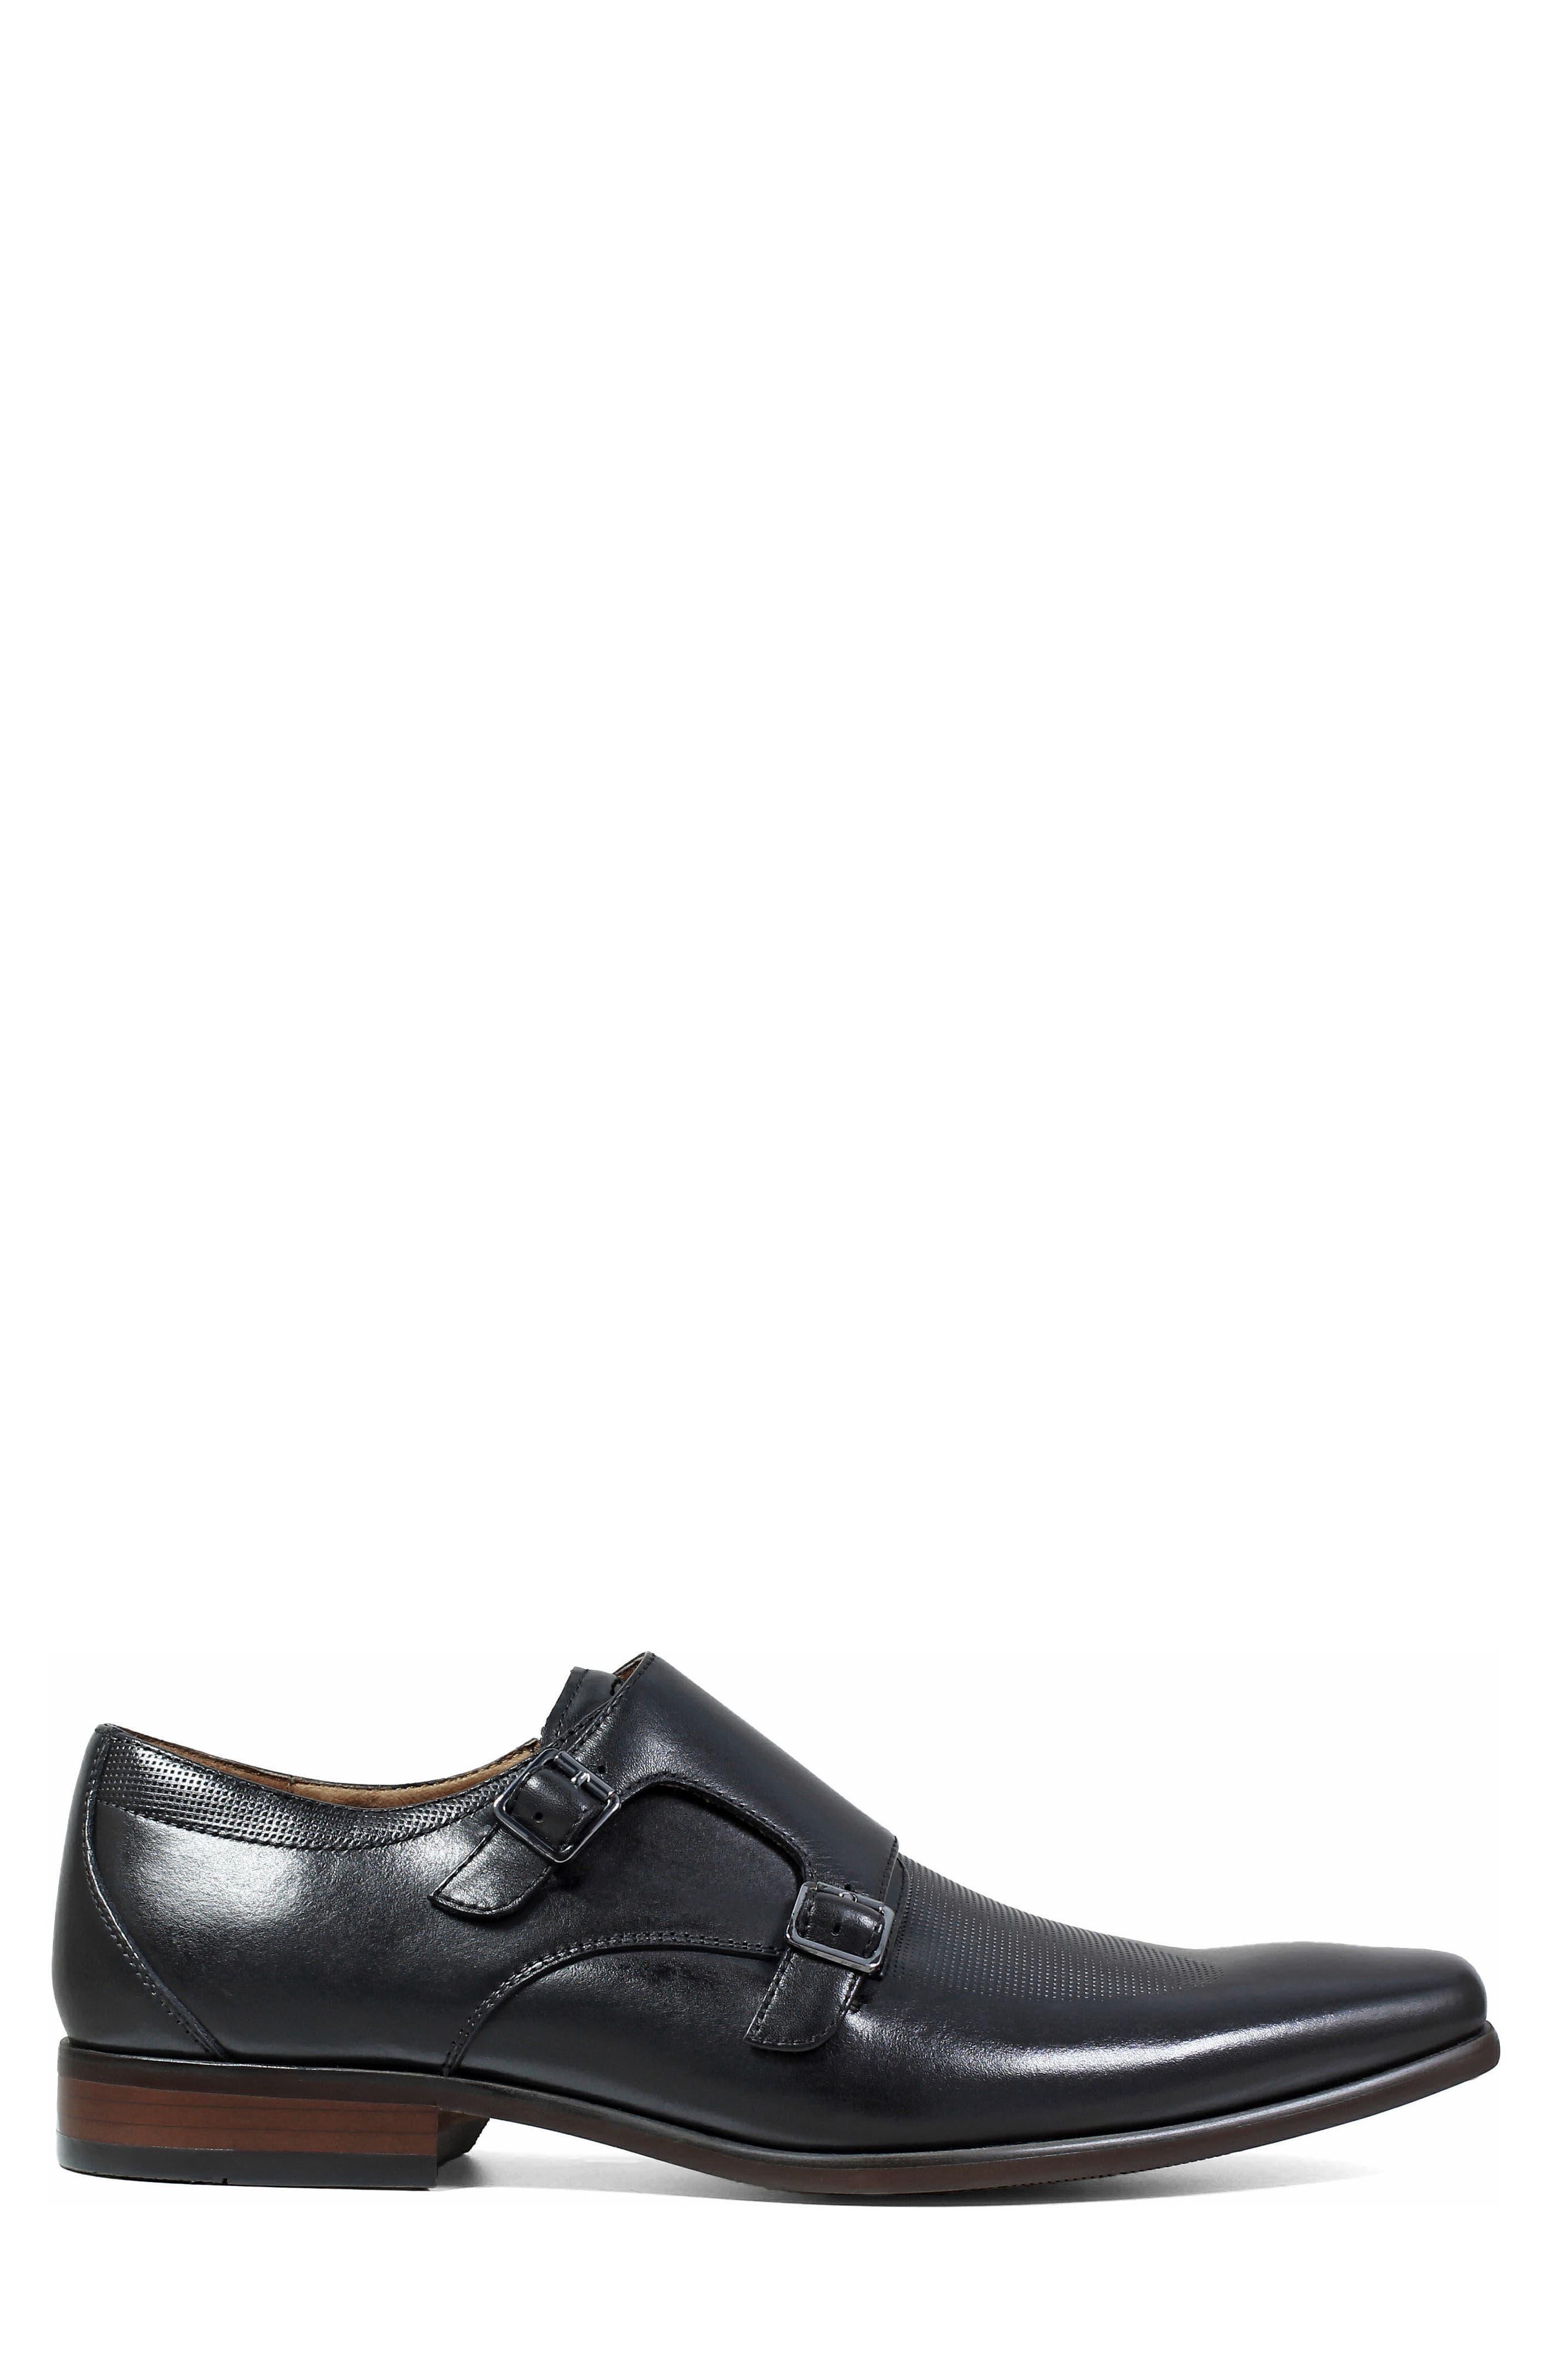 FLORSHEIM, Postino Textured Double Strap Monk Shoe, Alternate thumbnail 3, color, BLACK LEATHER